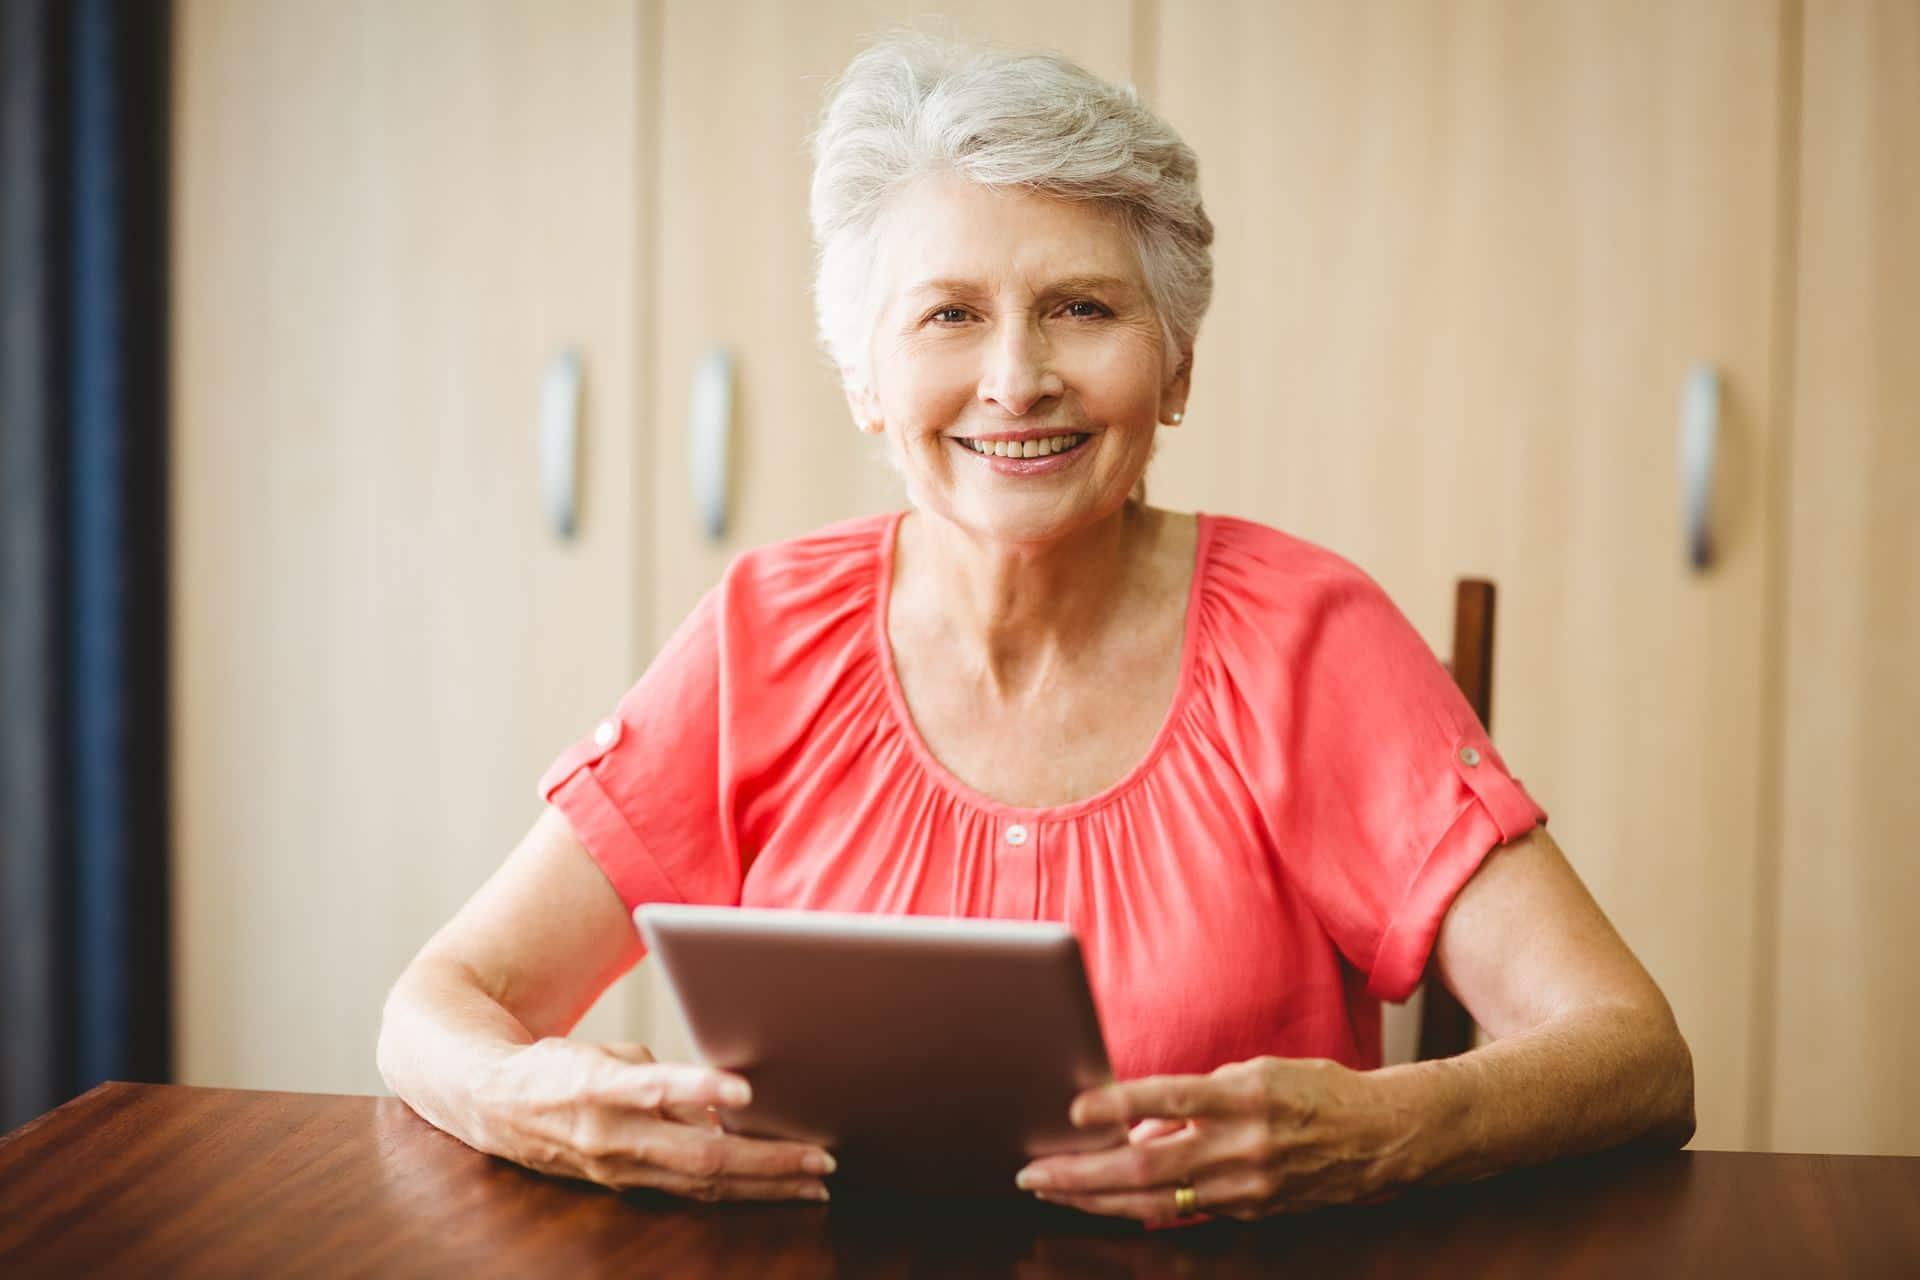 ריפוי בעיסוק אשדוד - Restart Therapy ריפוי בעיסוק למבוגרים